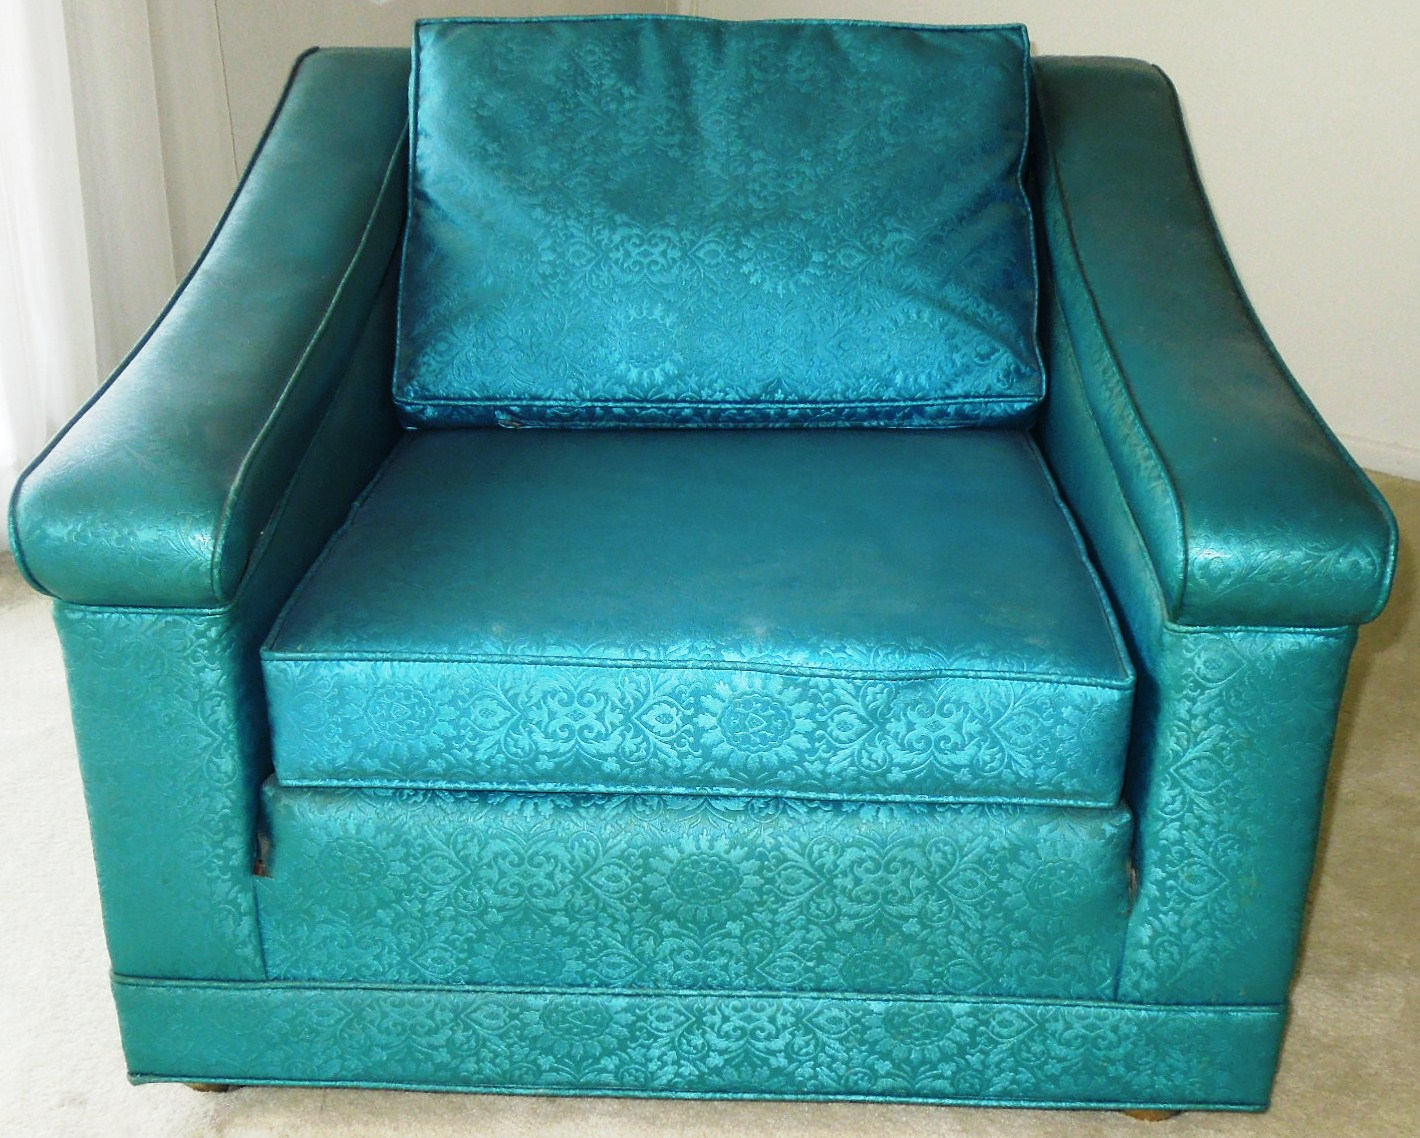 Vintage 1960s Luxury Lounge Chair Vinyl Blue Color For